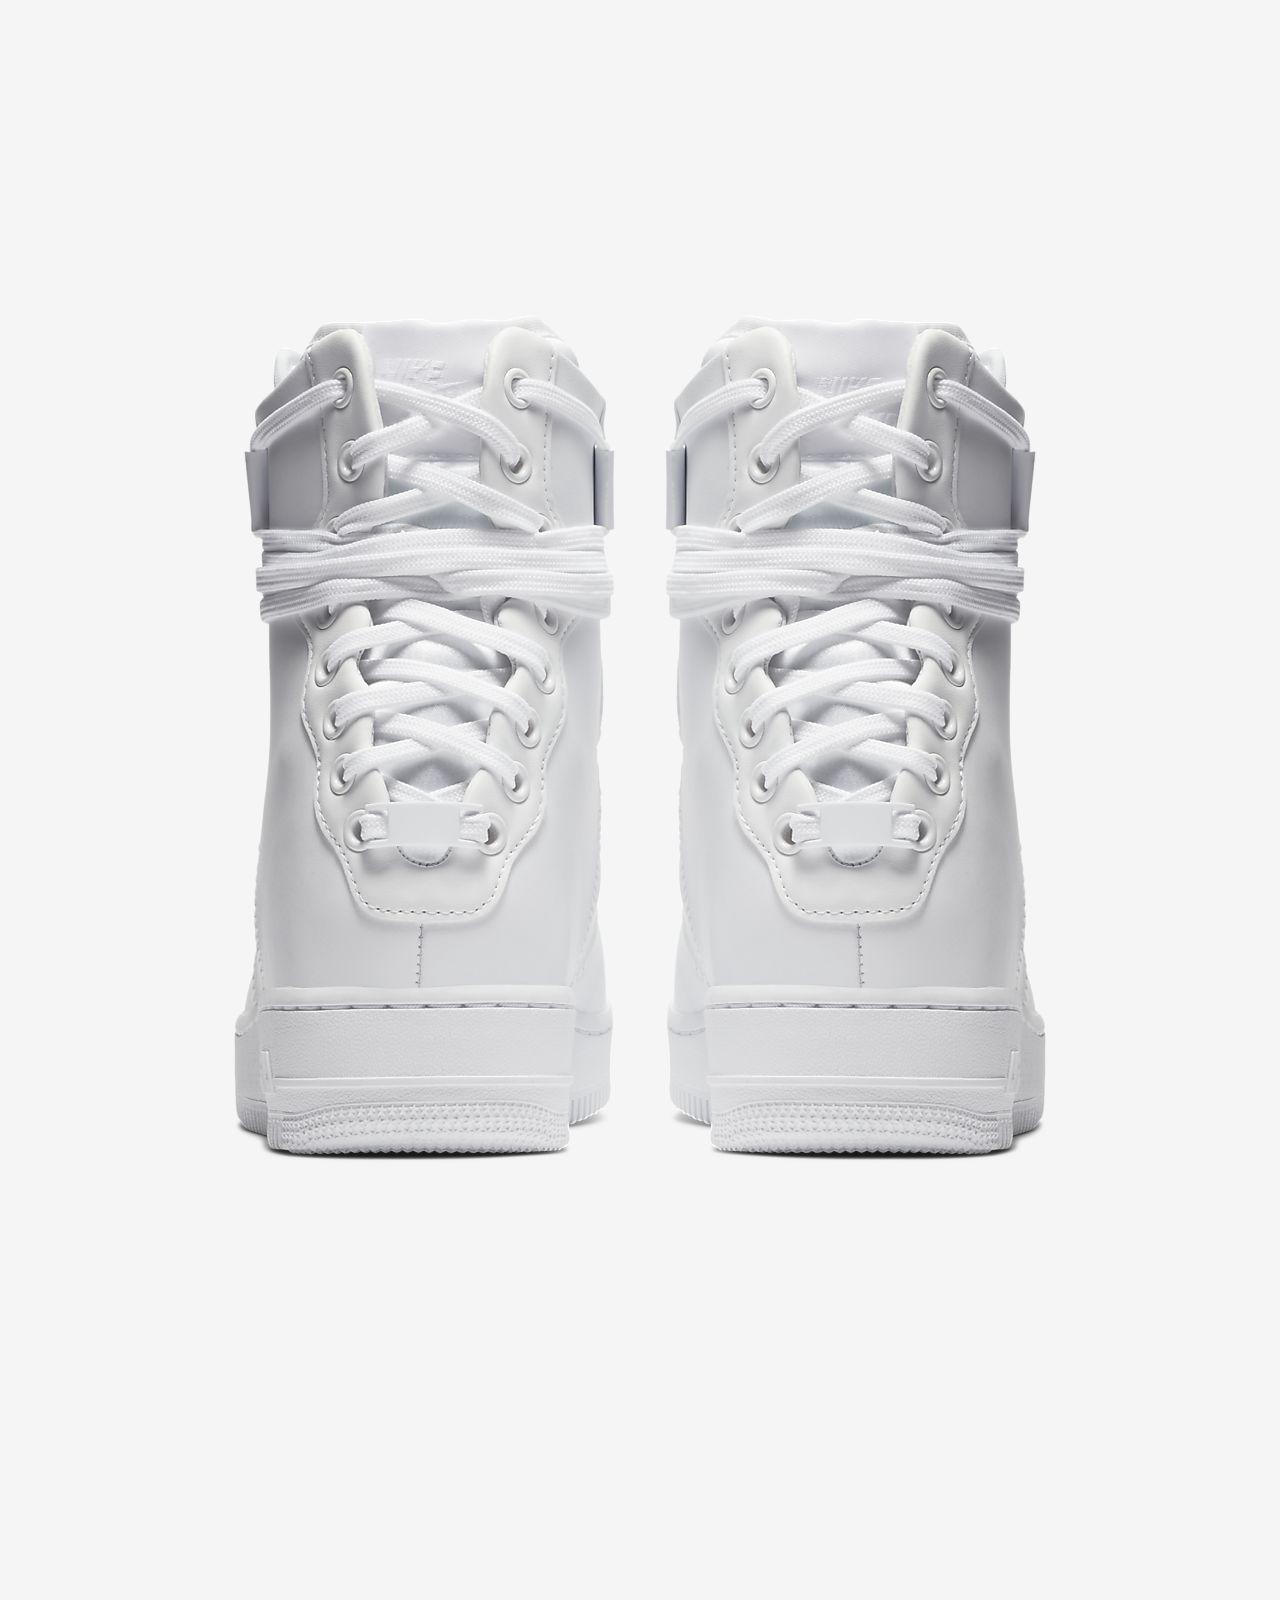 official photos d3a59 609d3 ... Nike AF1 Rebel XX Women s Shoe